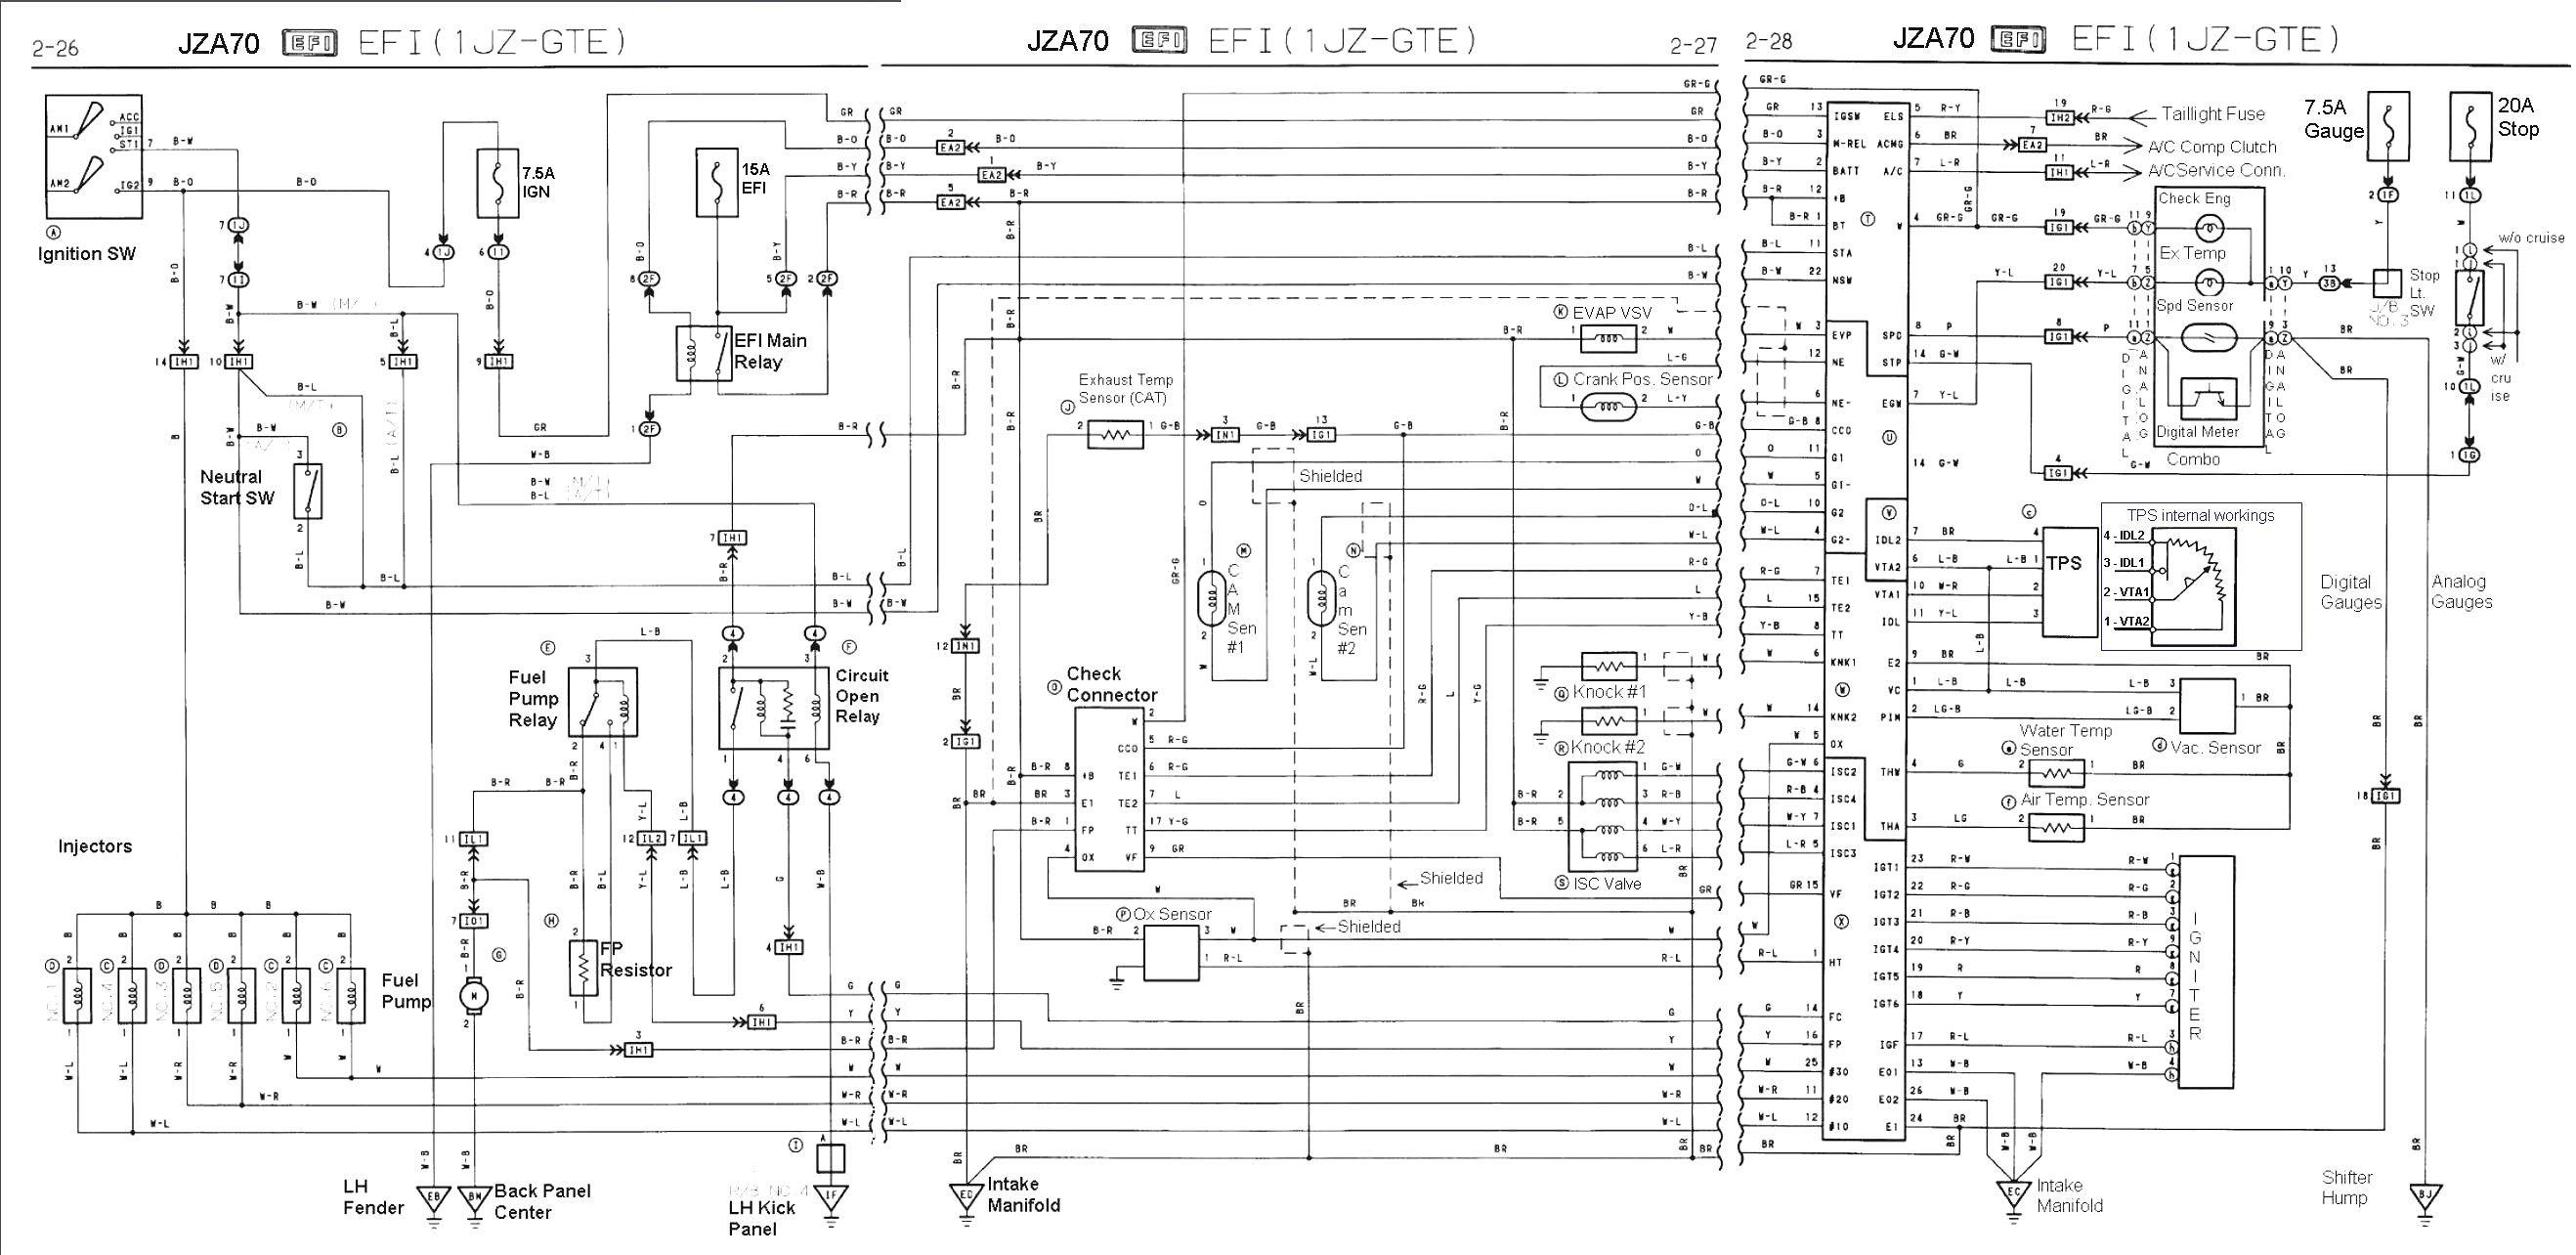 New Wiring Diagram For Bmw E46 Diagram Diagramtemplate